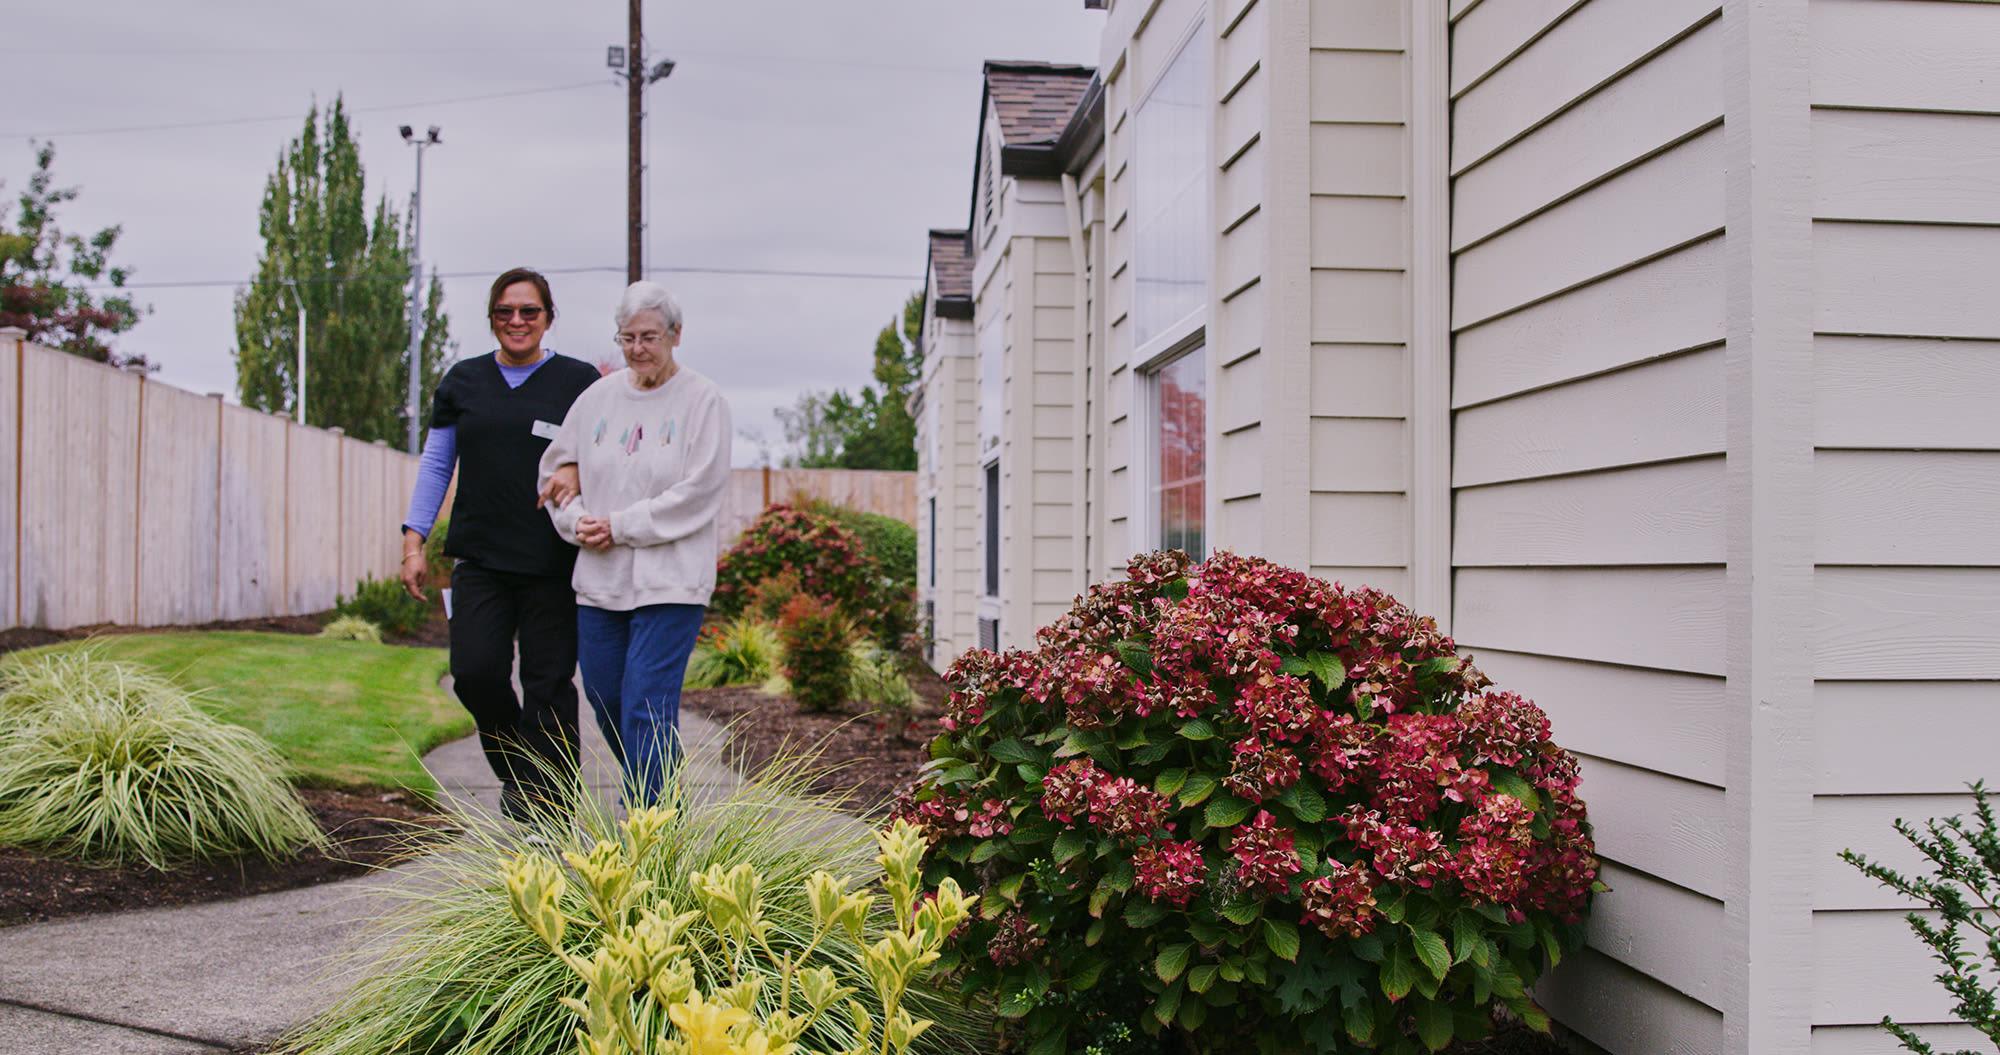 resident and a caretaker walking outside at Radiant Senior Living in Portland, Oregon